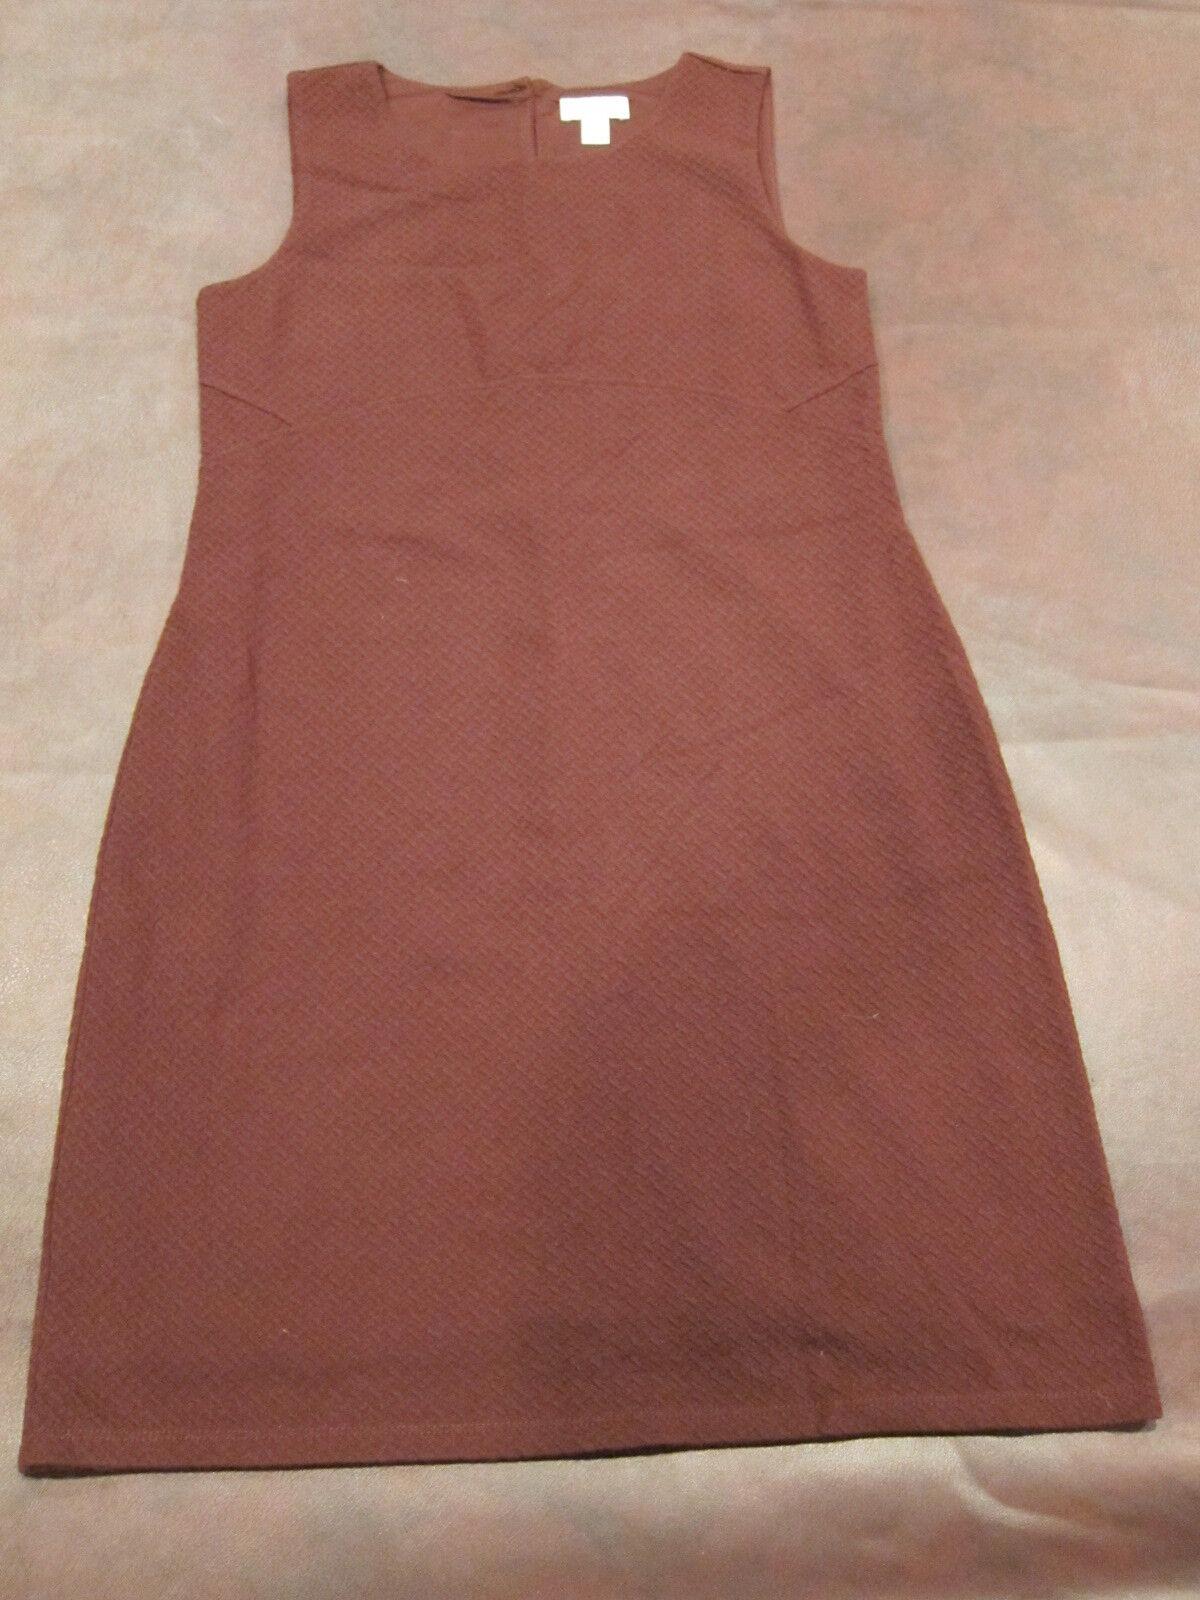 037e081cc153 Ann Taylor LOFT Size M Sleeveless Sheath Dress Maroon Burgundy Jersey Knit